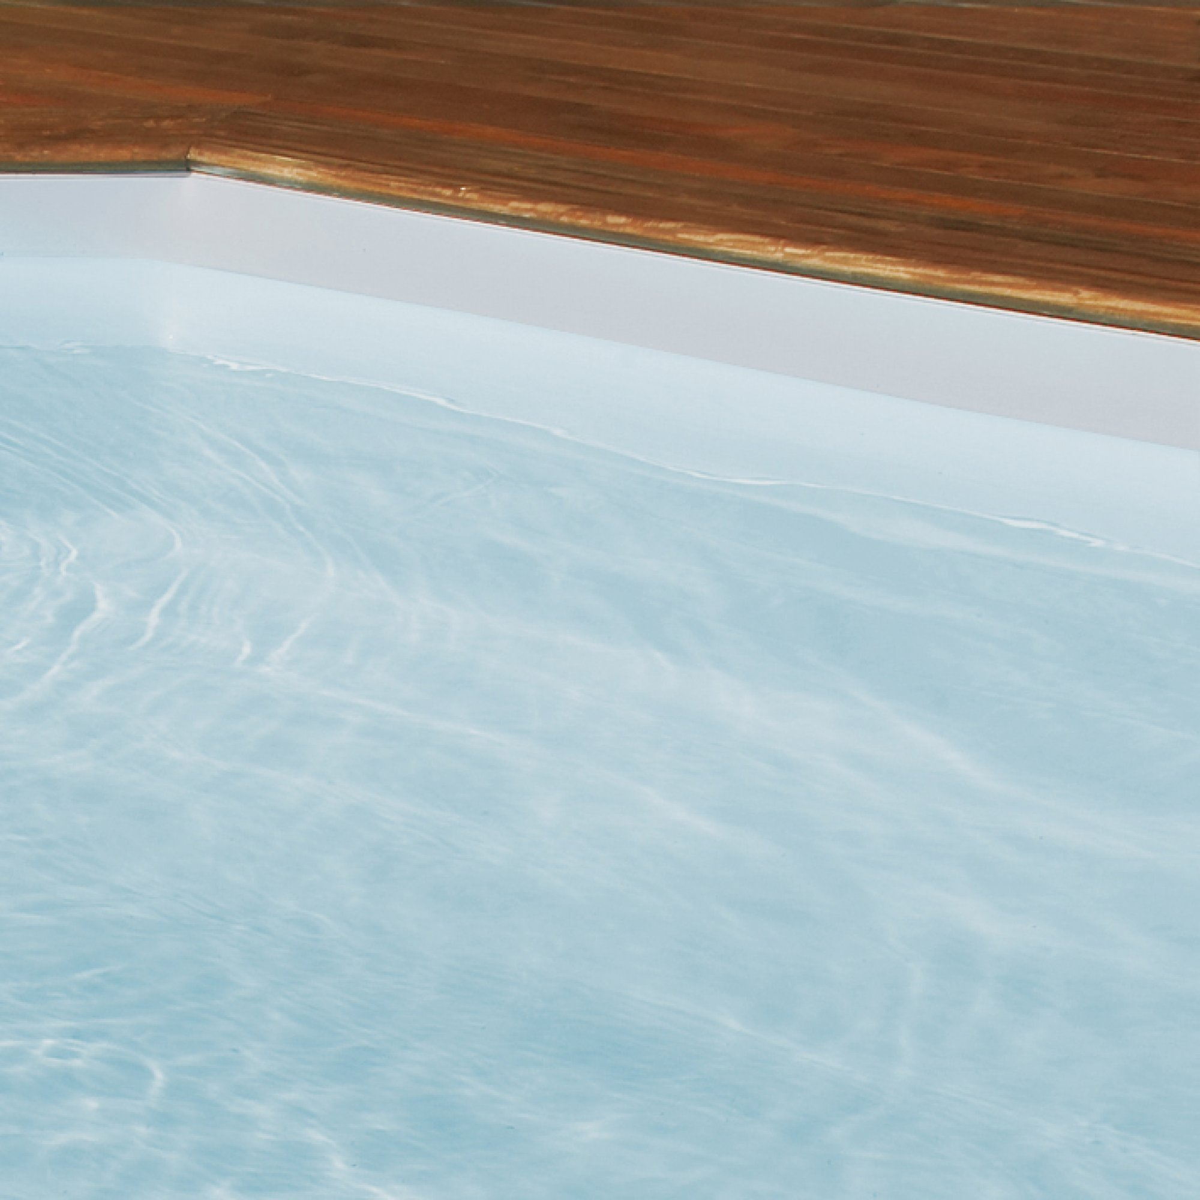 Poolfolie wellpool24 classic grau 13 50 for Poolfolie farbe